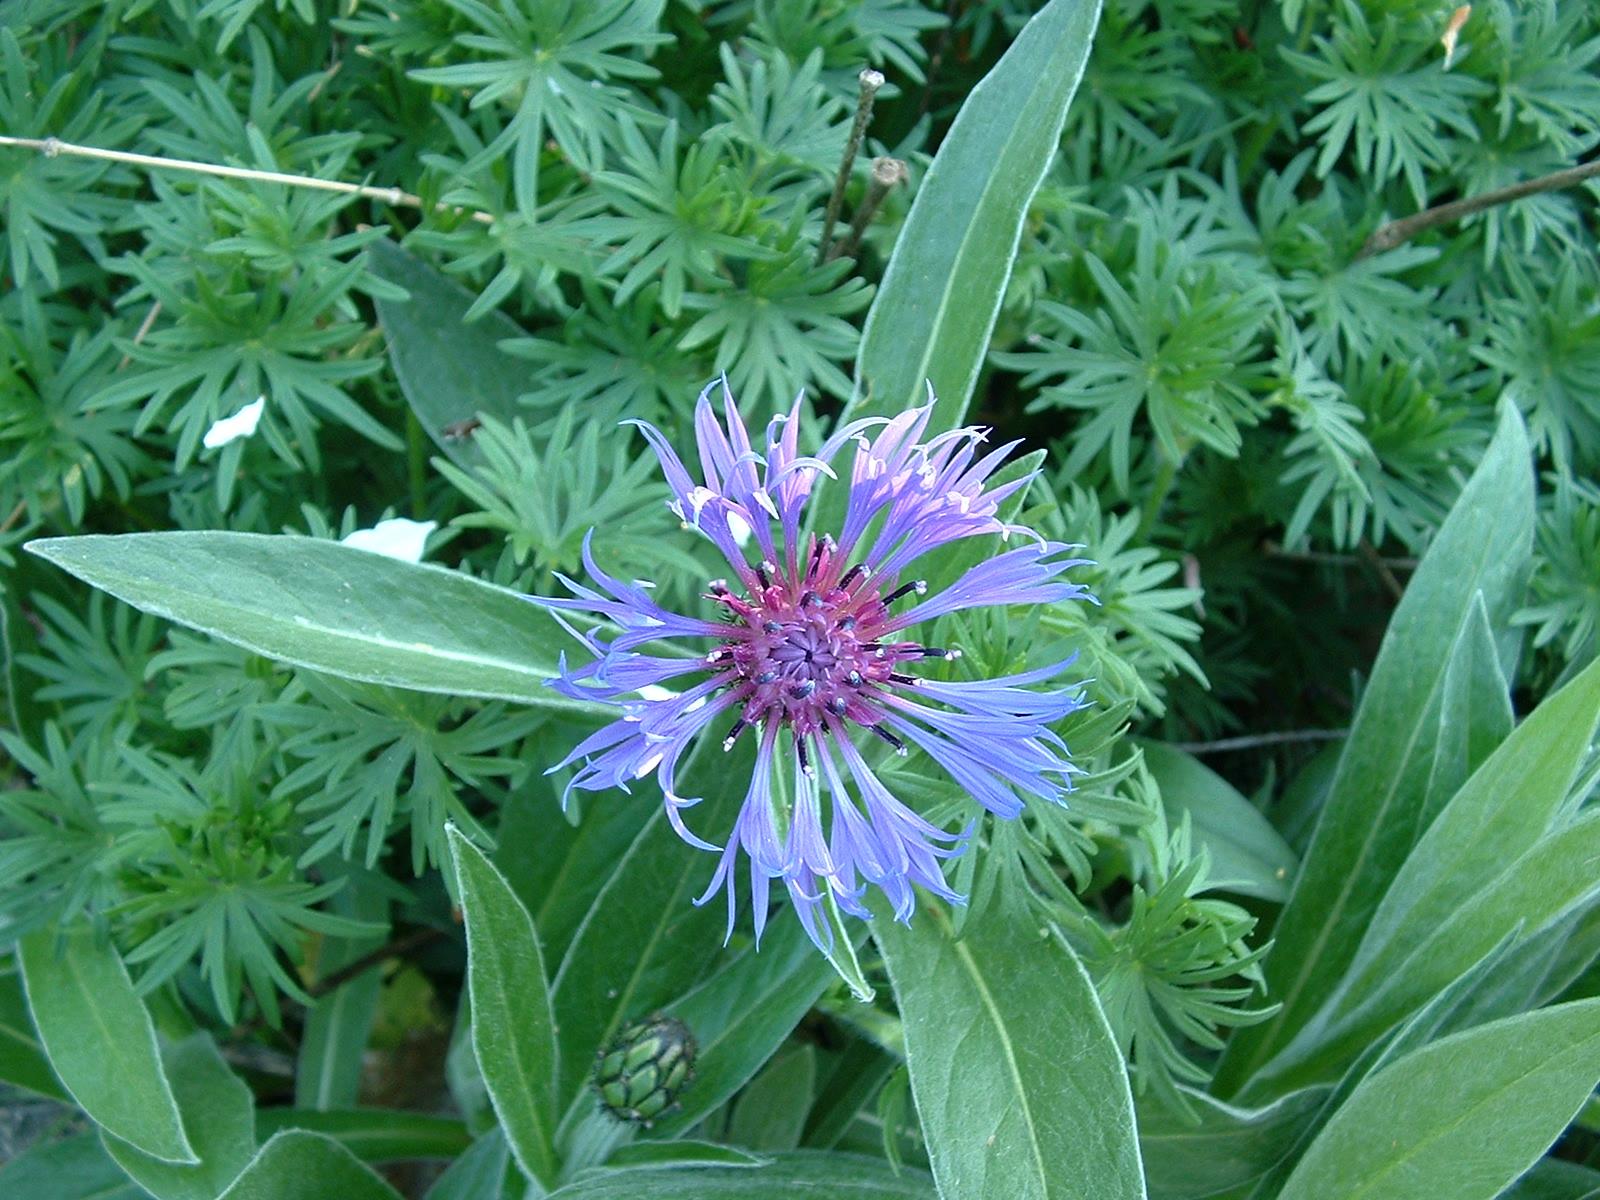 File Bleuet Cornflower Aciano Wikimedia mons